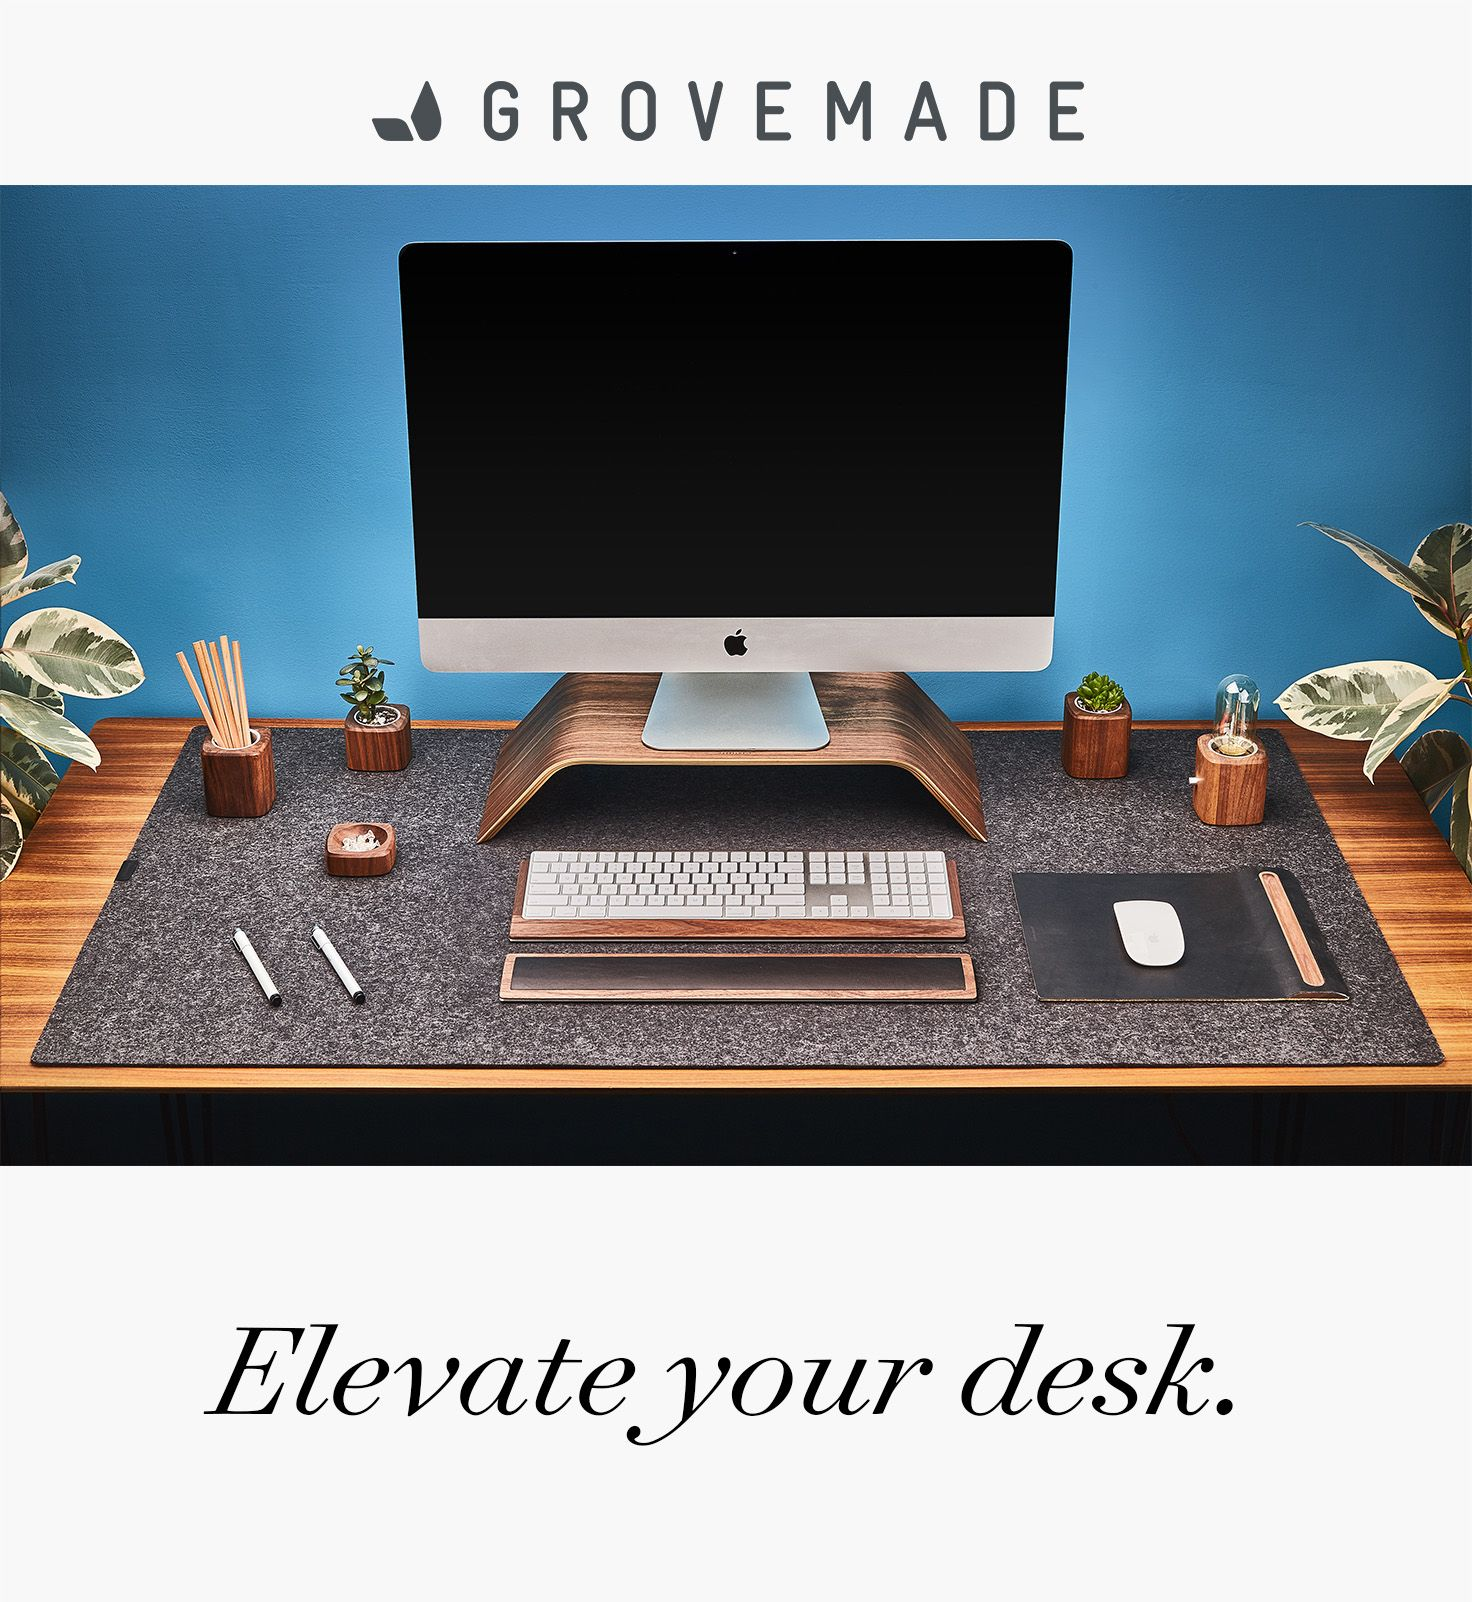 Modern Desk Accessories In 2020 Modern Desk Accessories Organizing Systems Shelf Organization